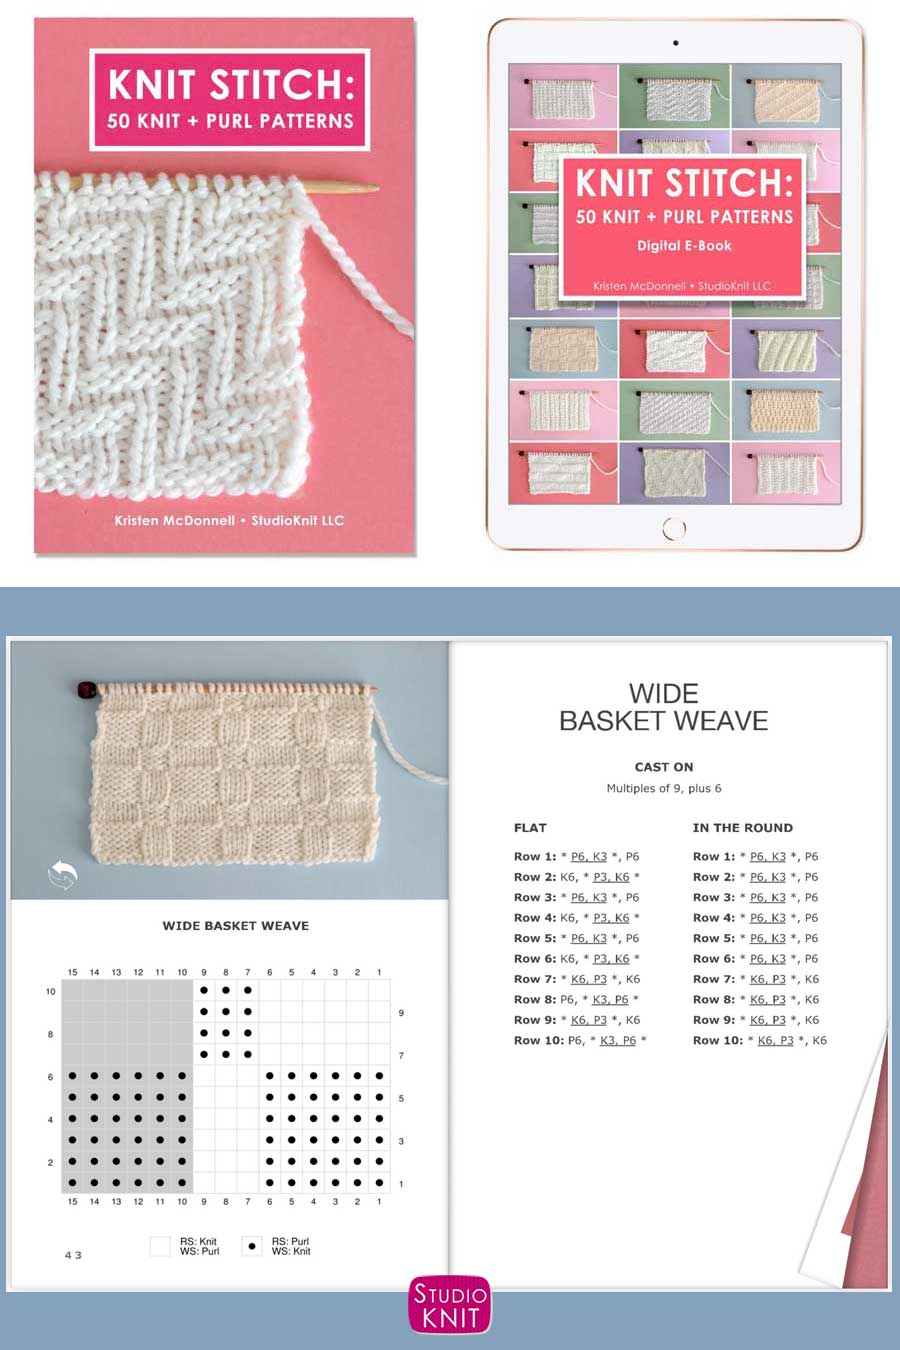 Knit Stitch Pattern Book with Wide Basket Weave Stitch by Studio Knit